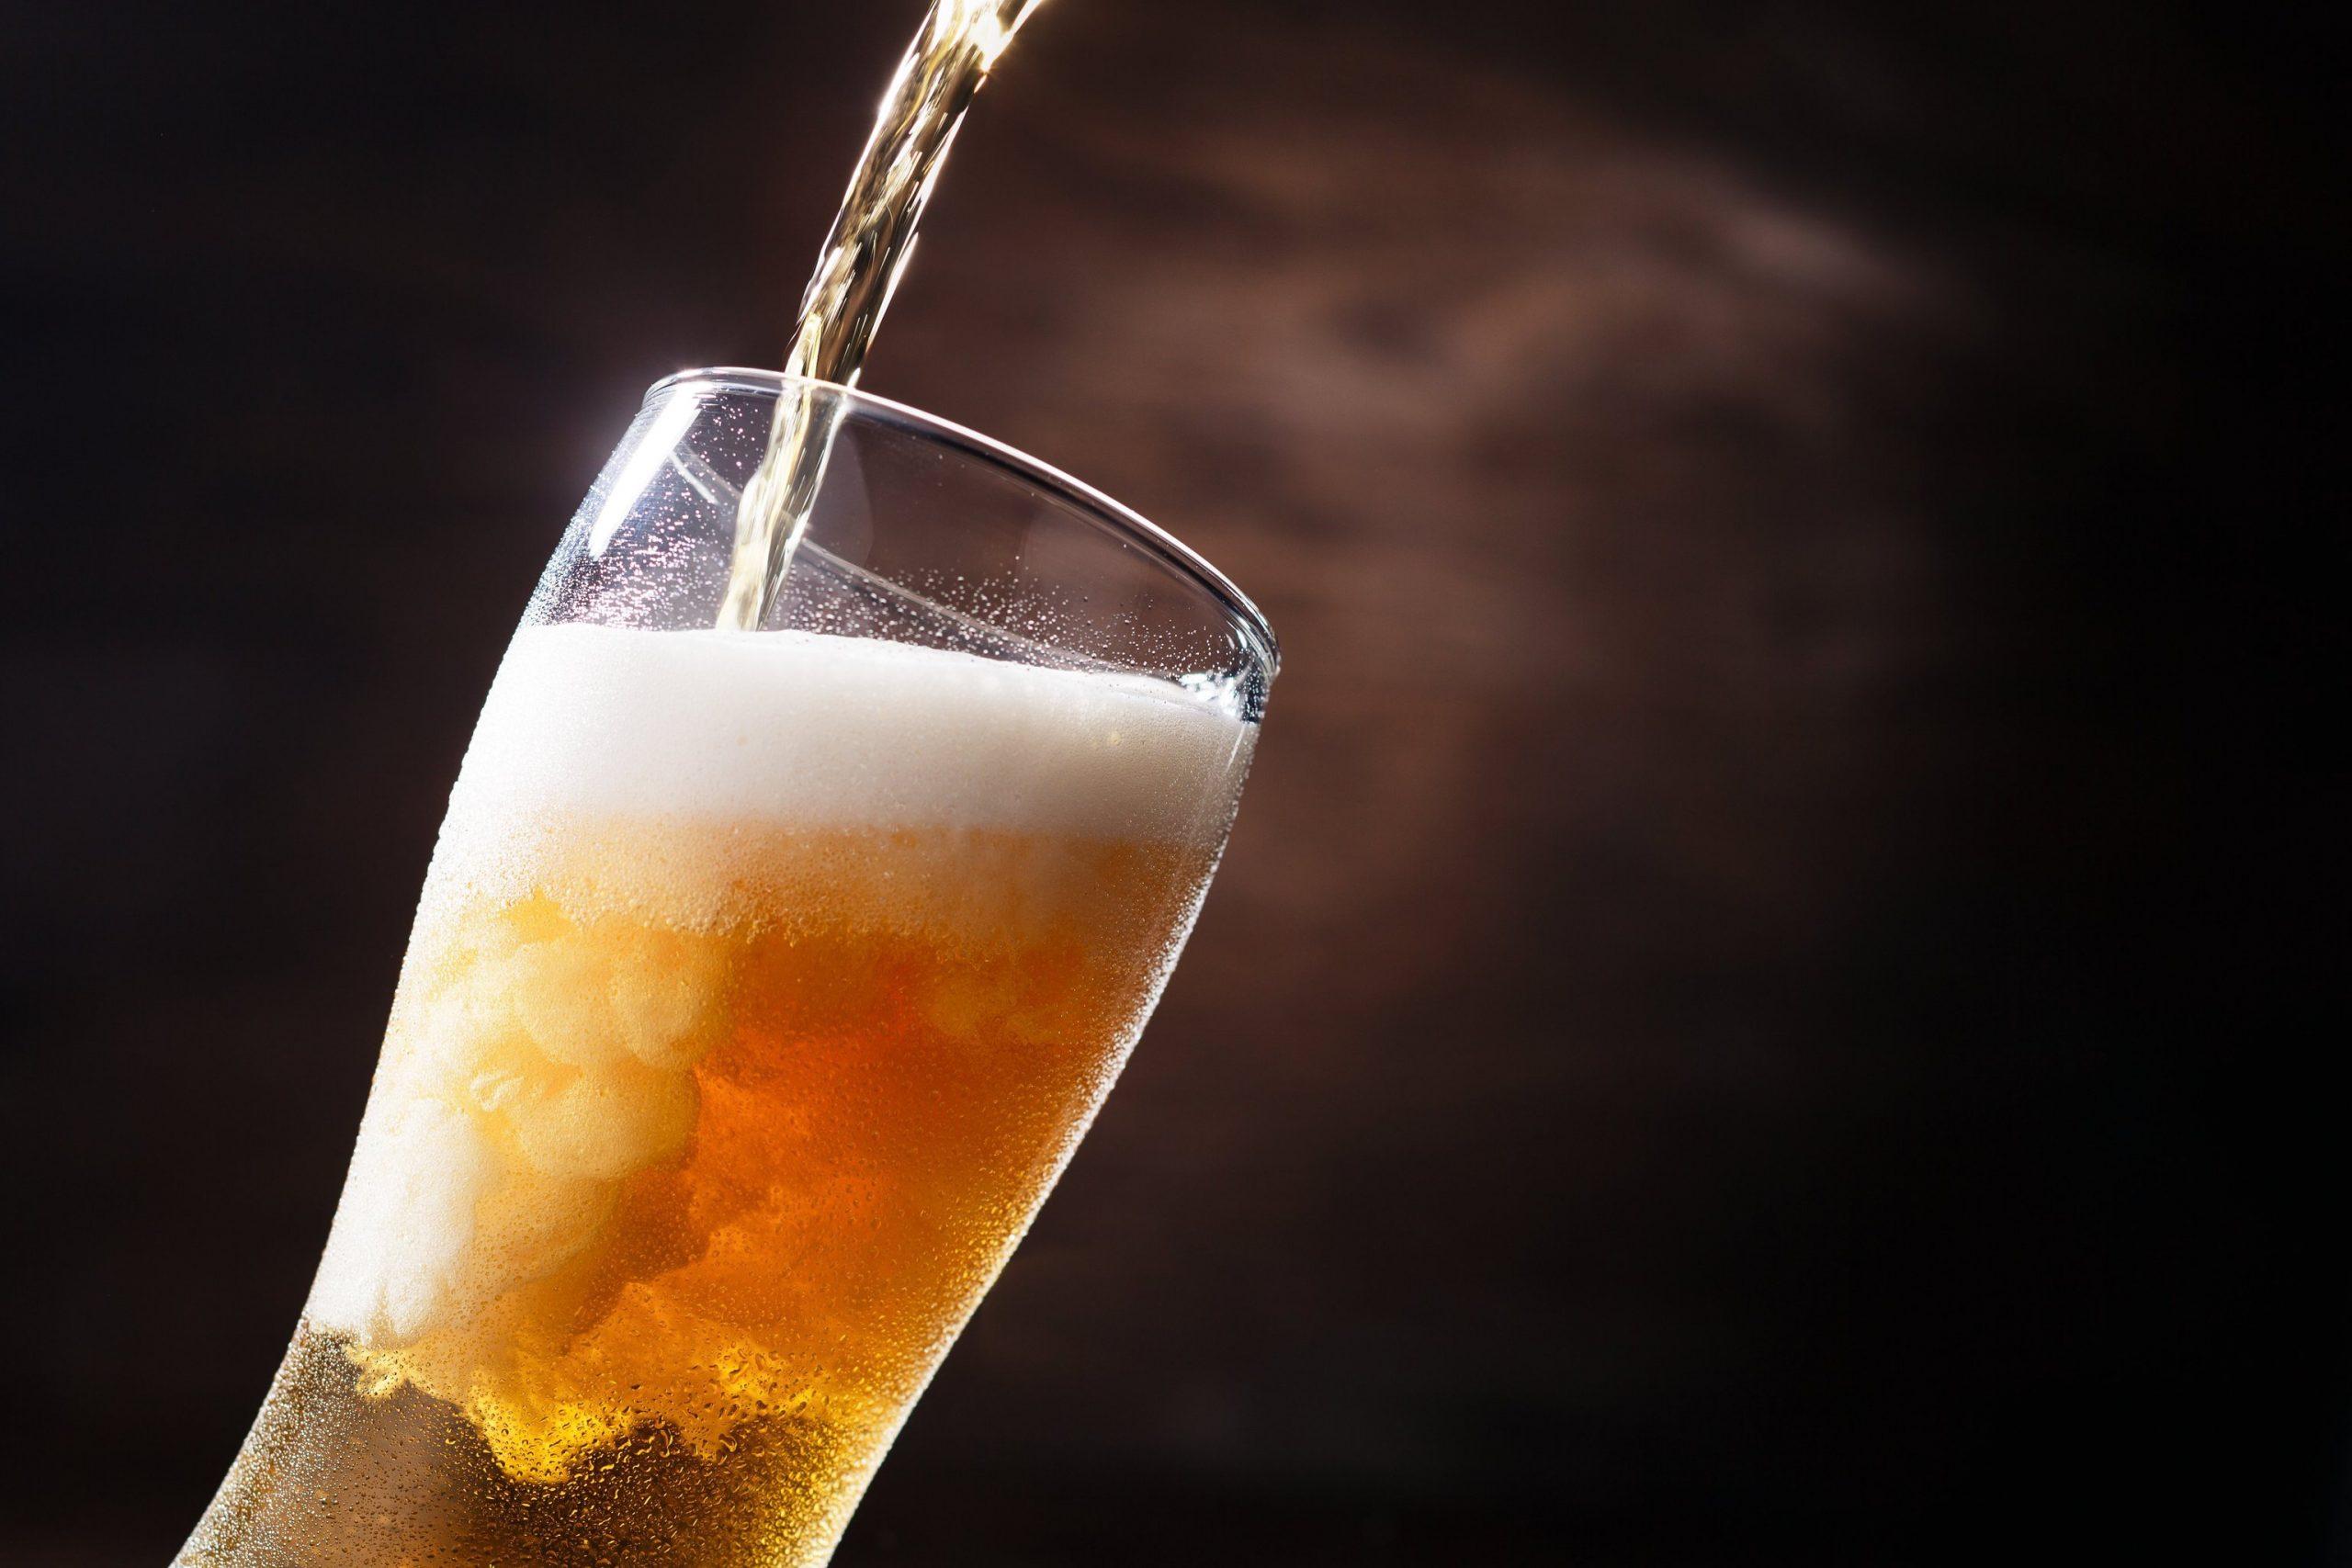 Bier im Bierglas